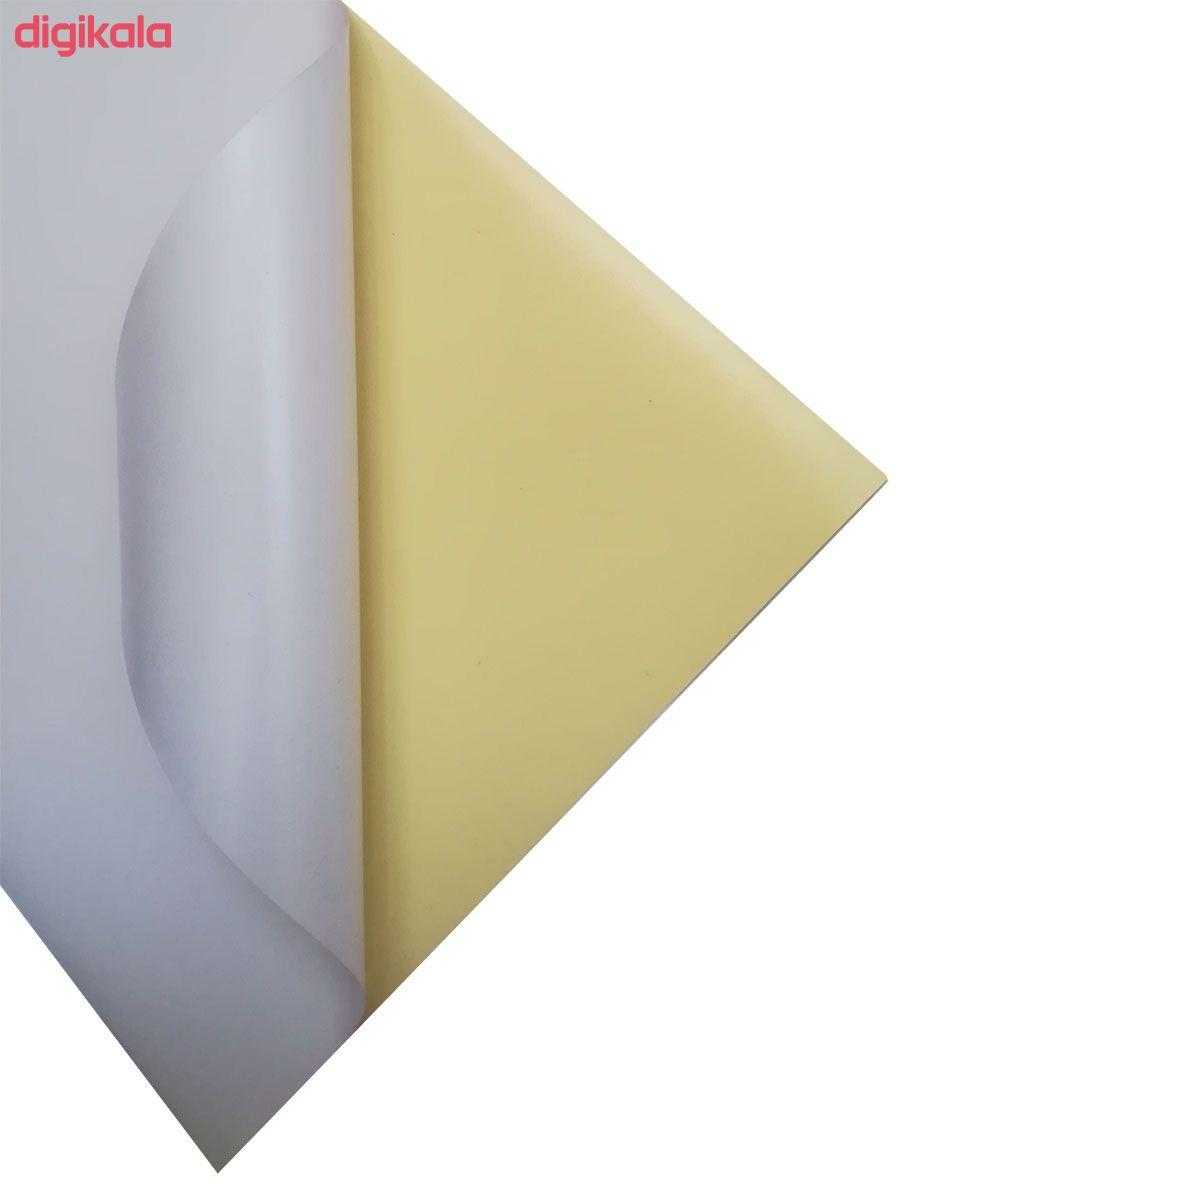 کاغذ چاپ رفیق مدل 102 سایز A4 بسته 20 عددی main 1 1